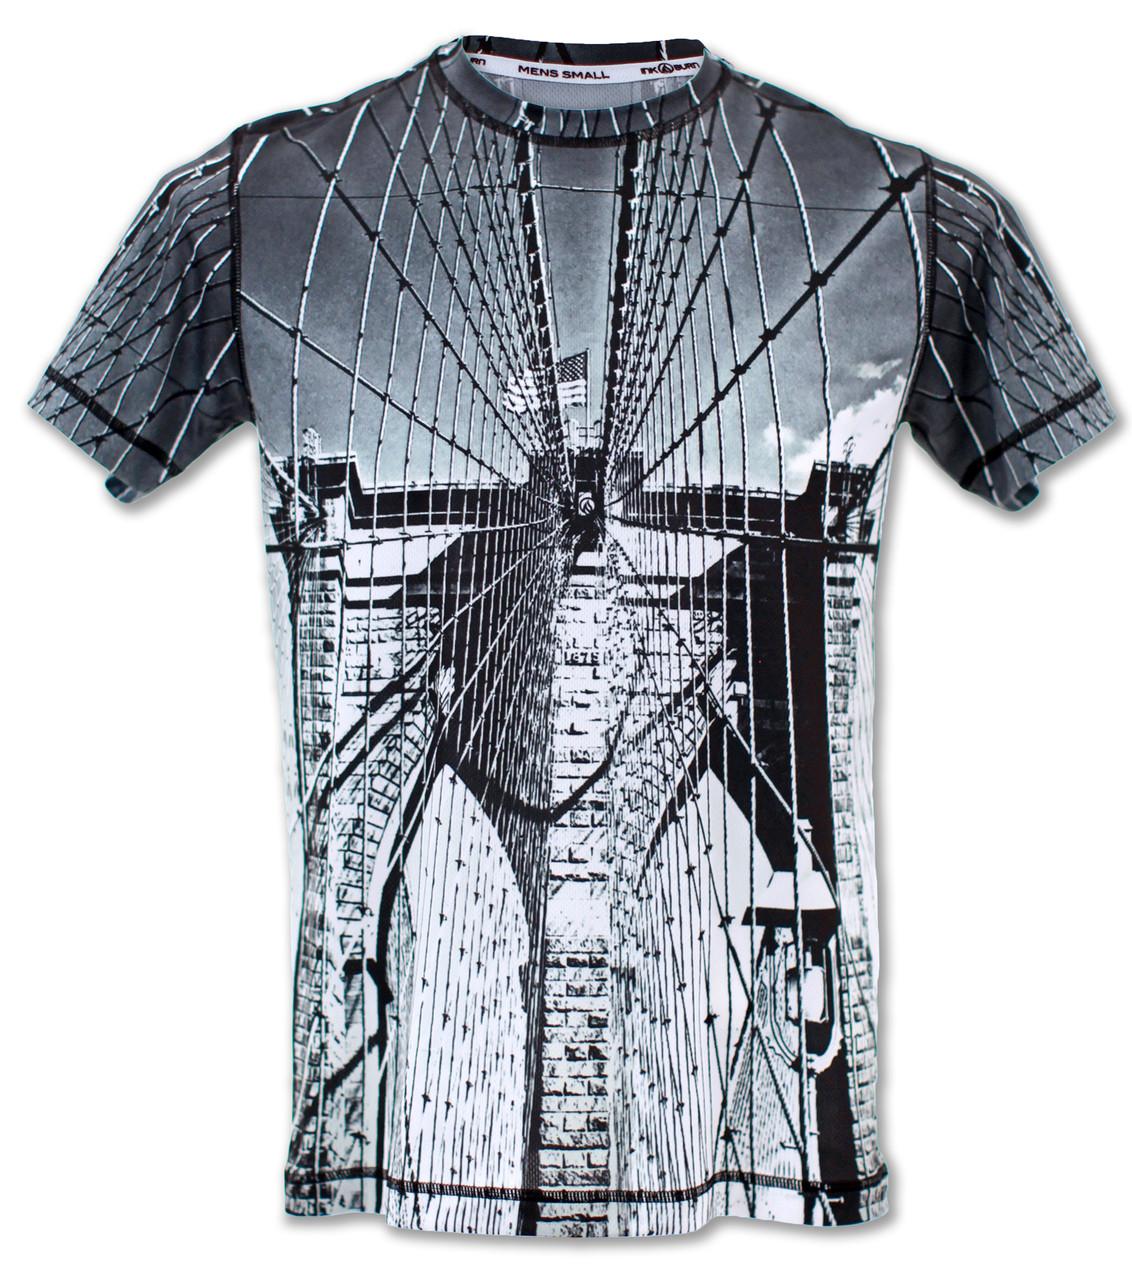 INKnBURN Men's Tribute Tech Shirt Front